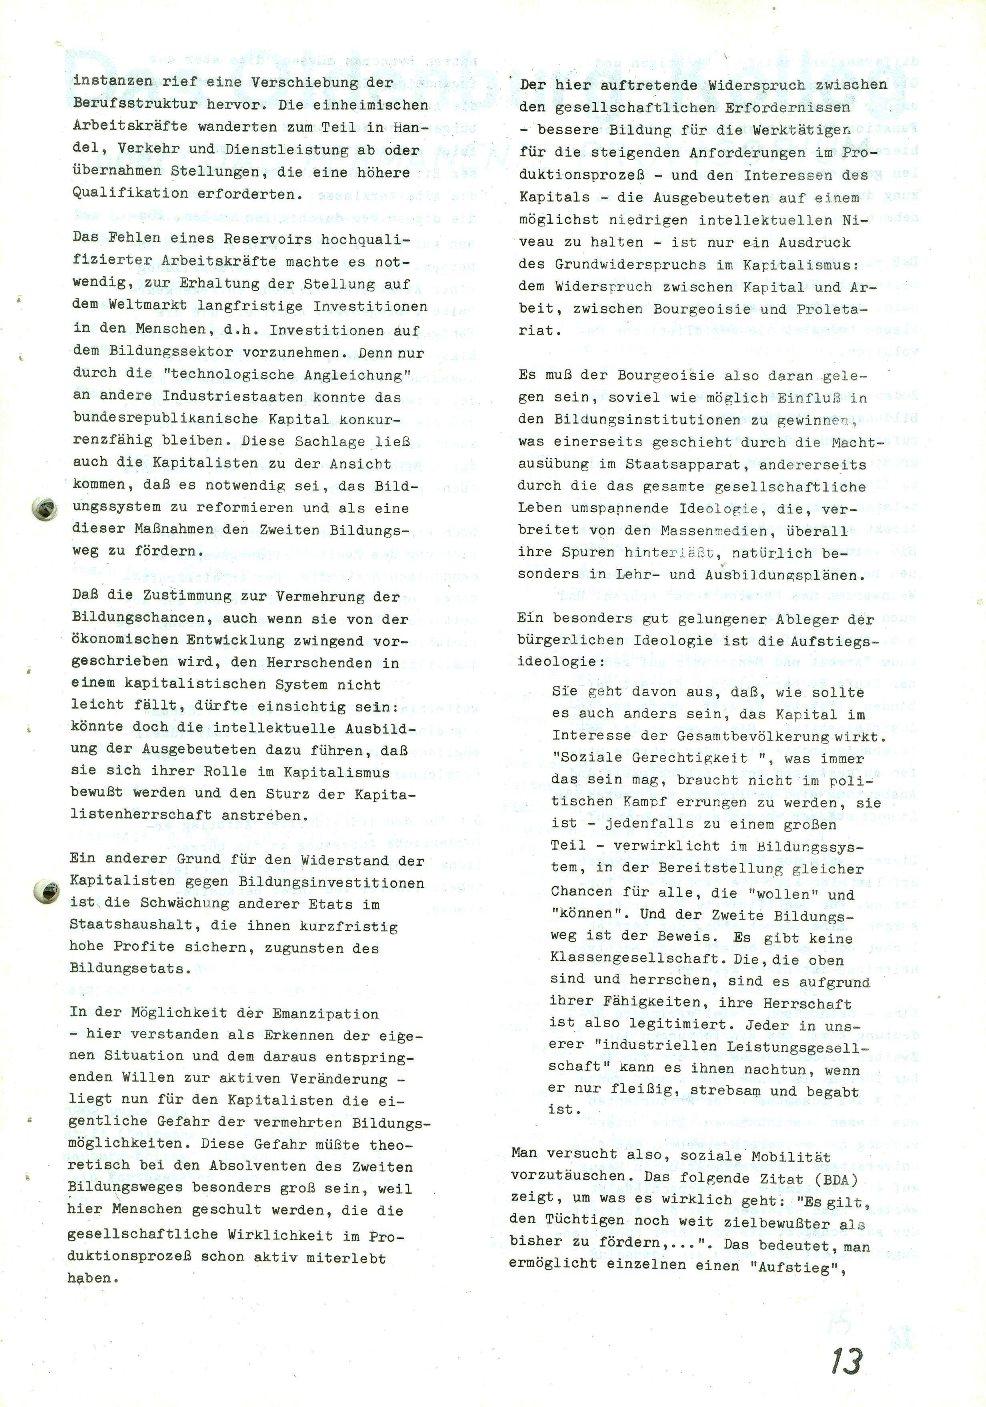 Oldenburg_KBW067